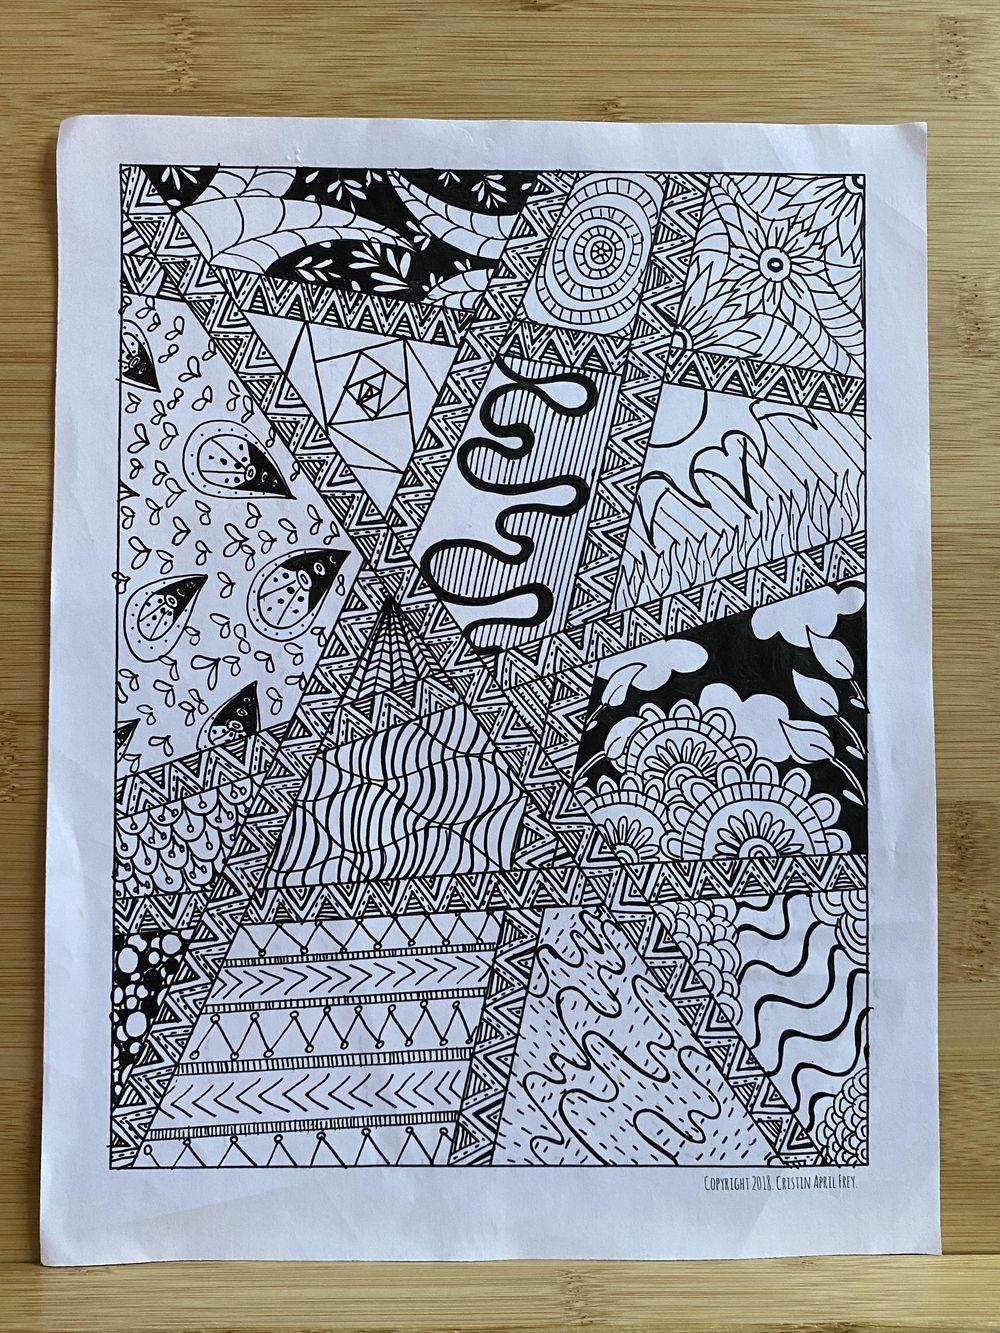 Doodling worksheets - image 1 - student project